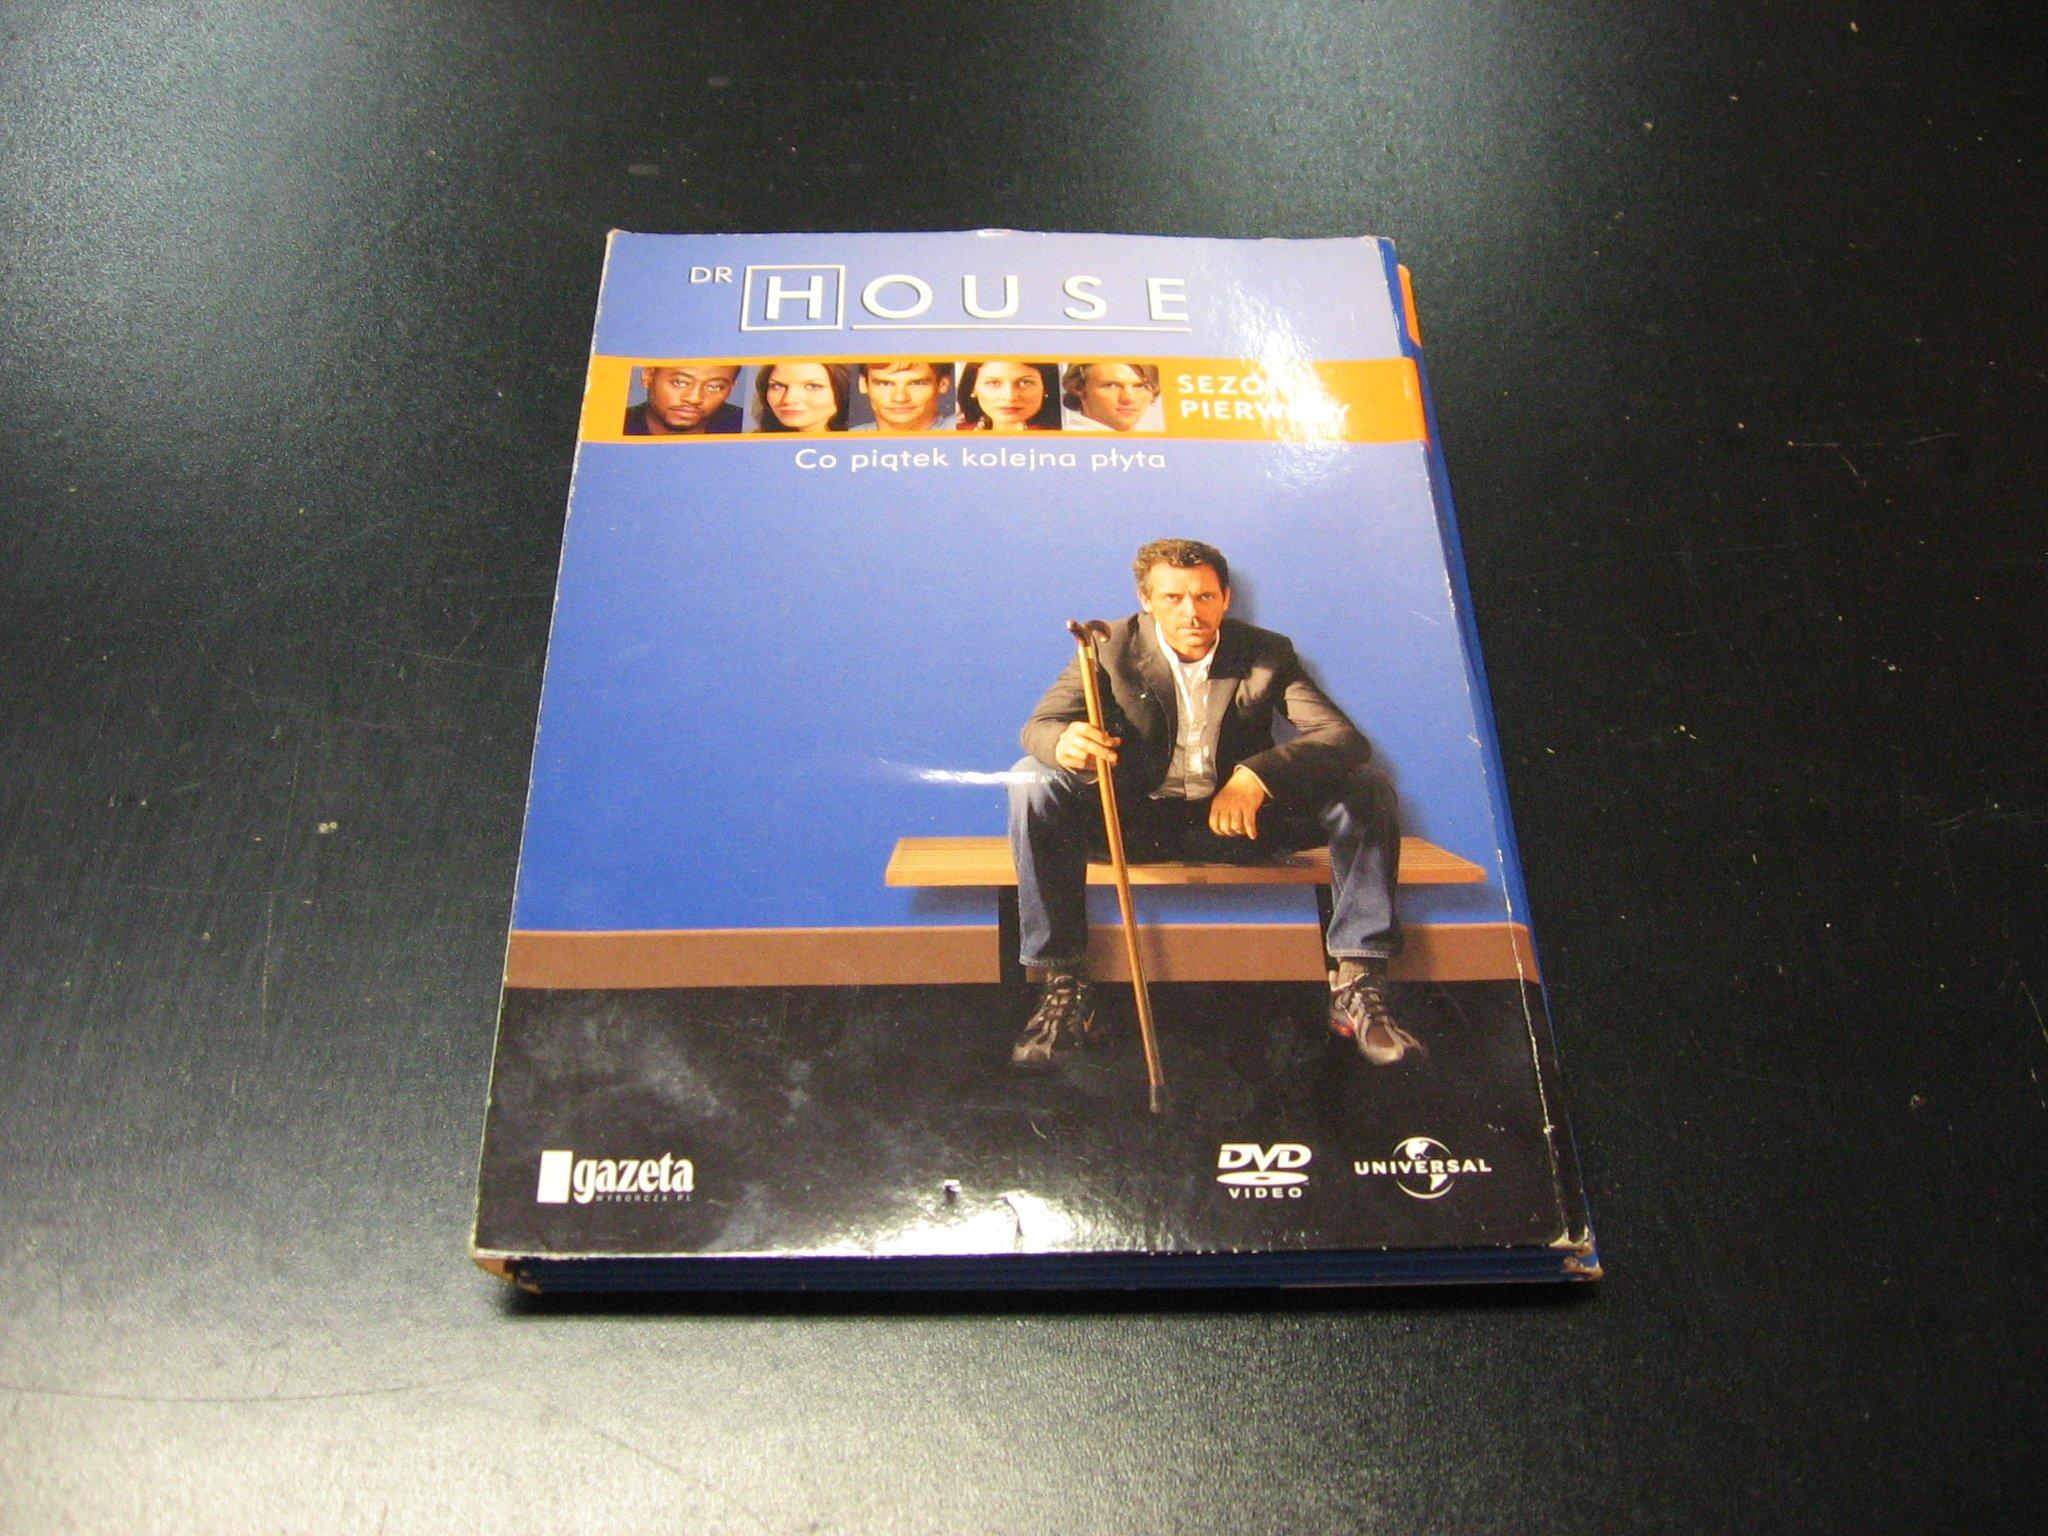 Doktor House Dr MD Sezon Pierwszy DVD 7 płyt - Sklep